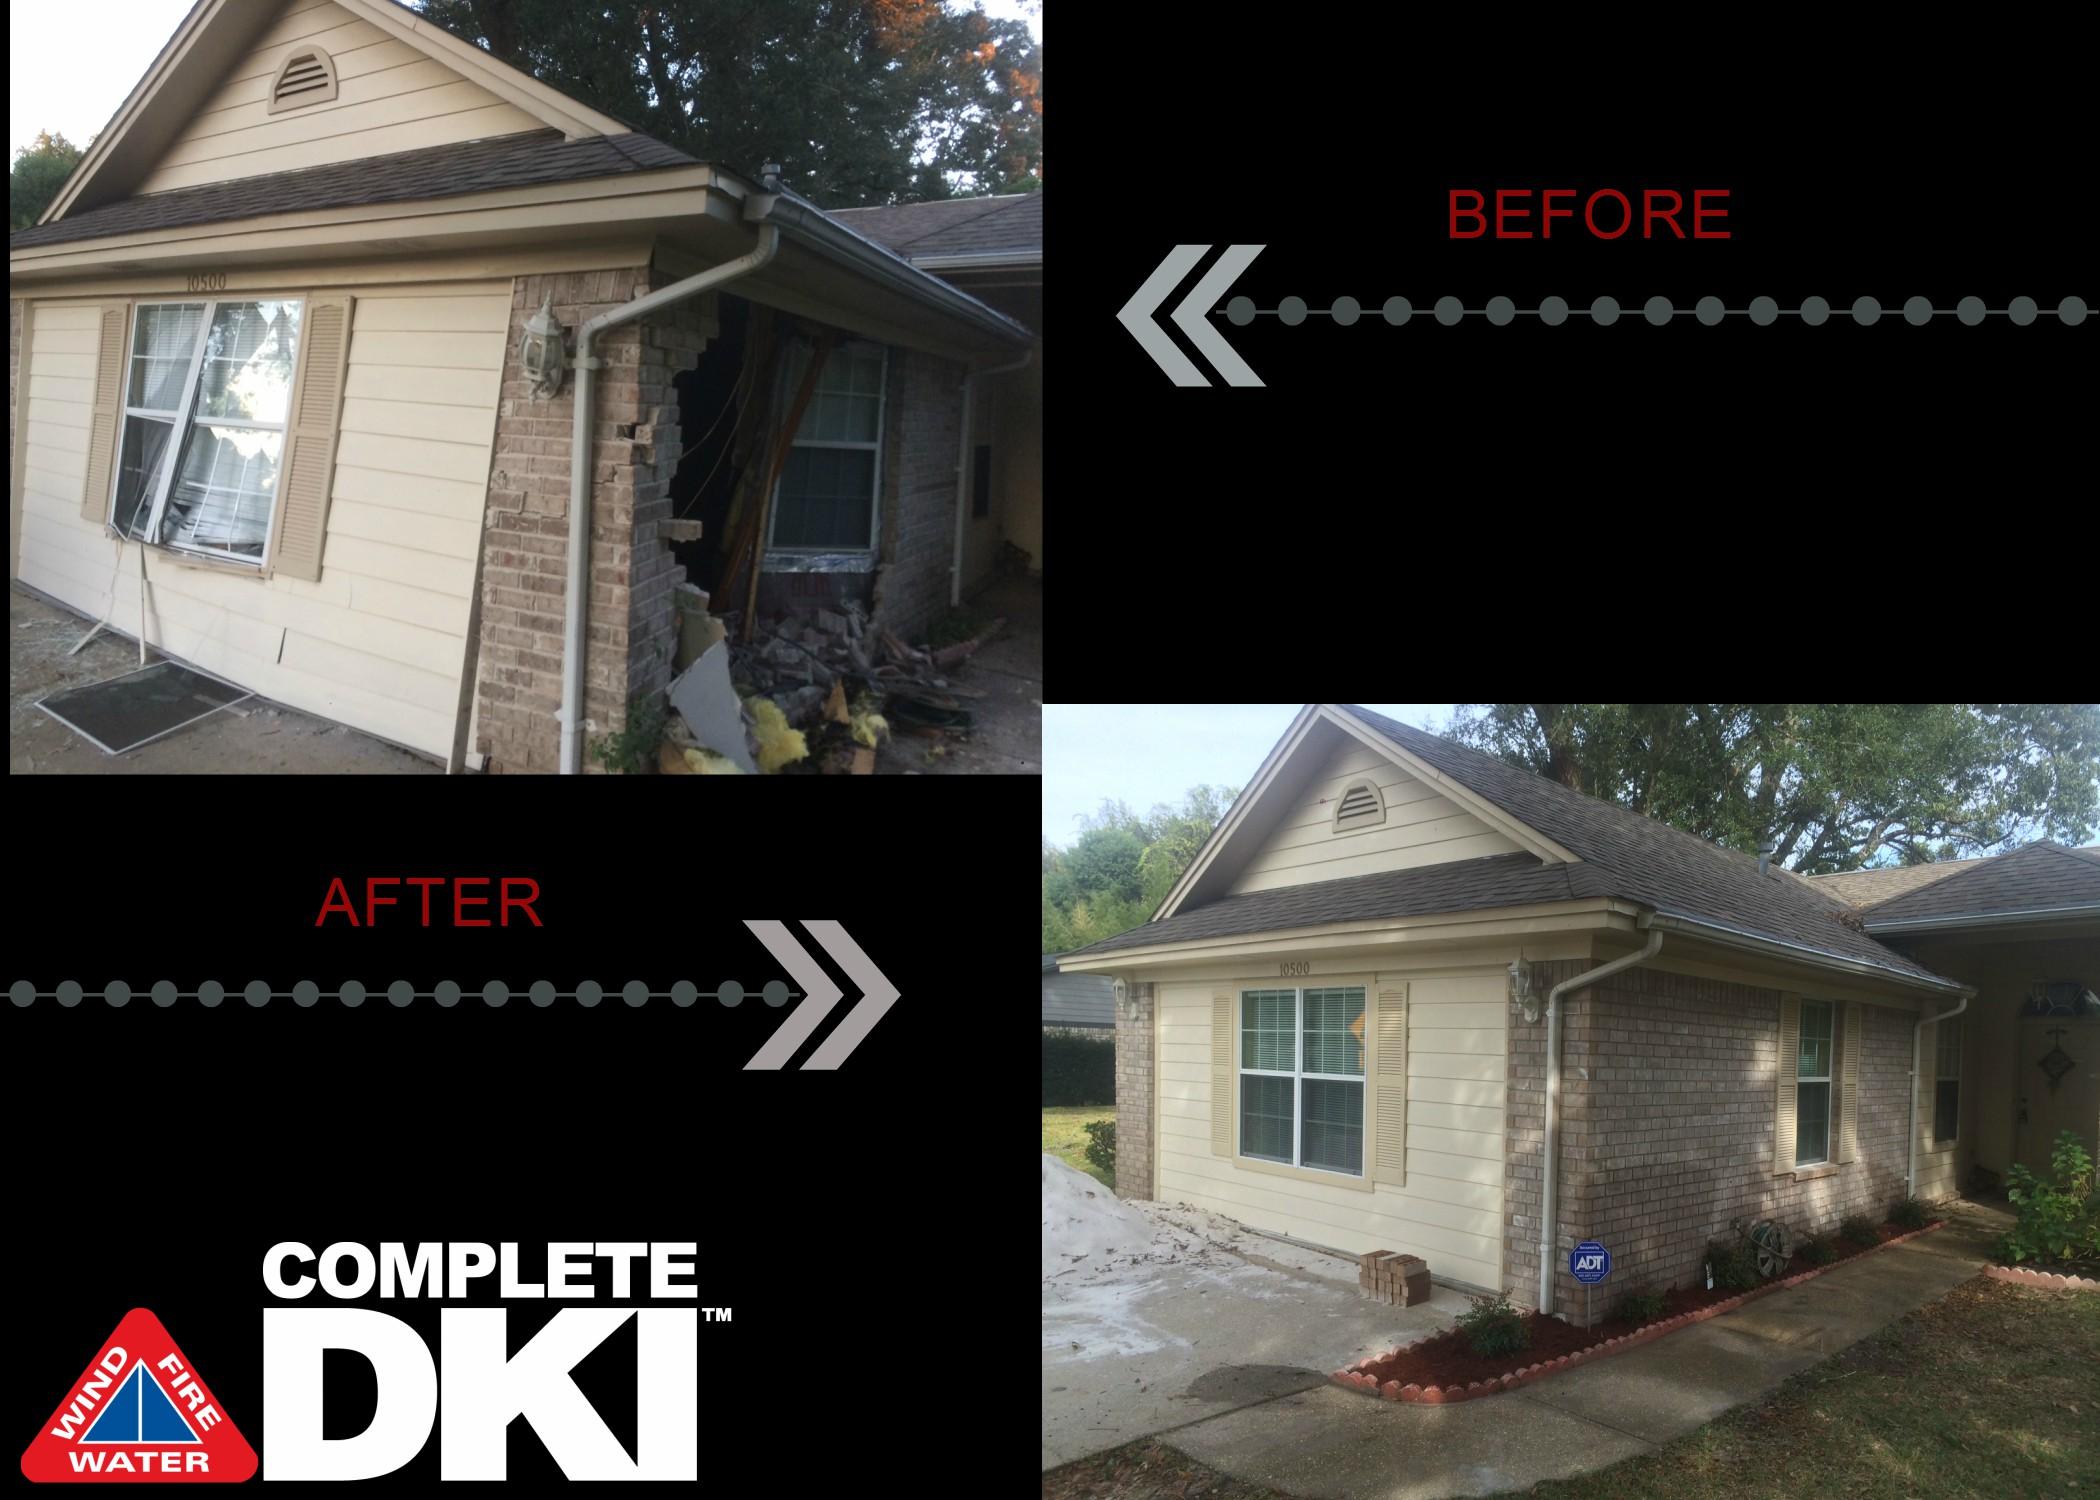 Complete DKI image 4